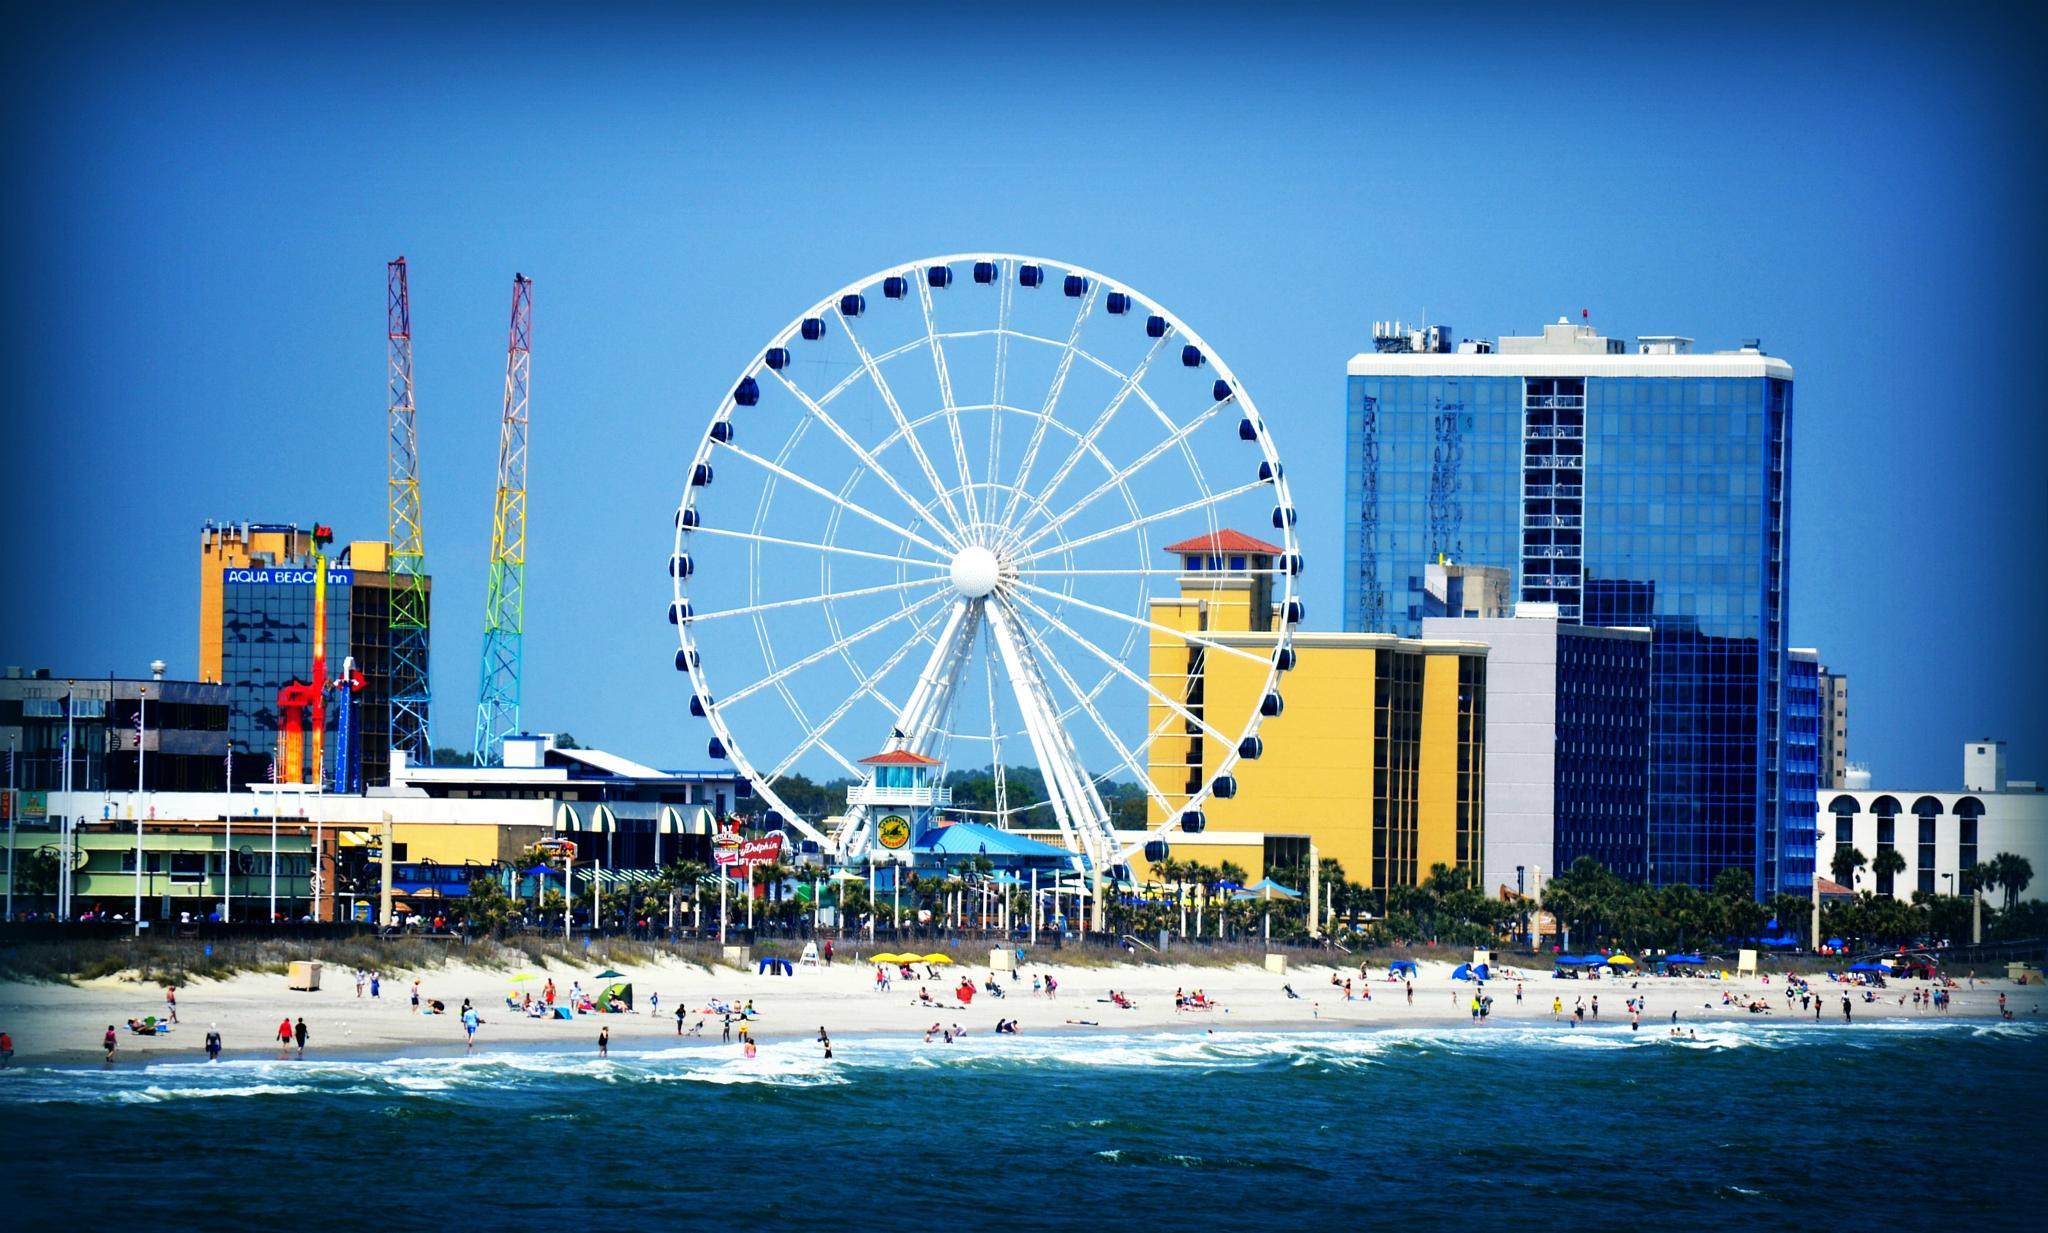 Myrtle Beach, SC Sky Wheel by lindandarrell